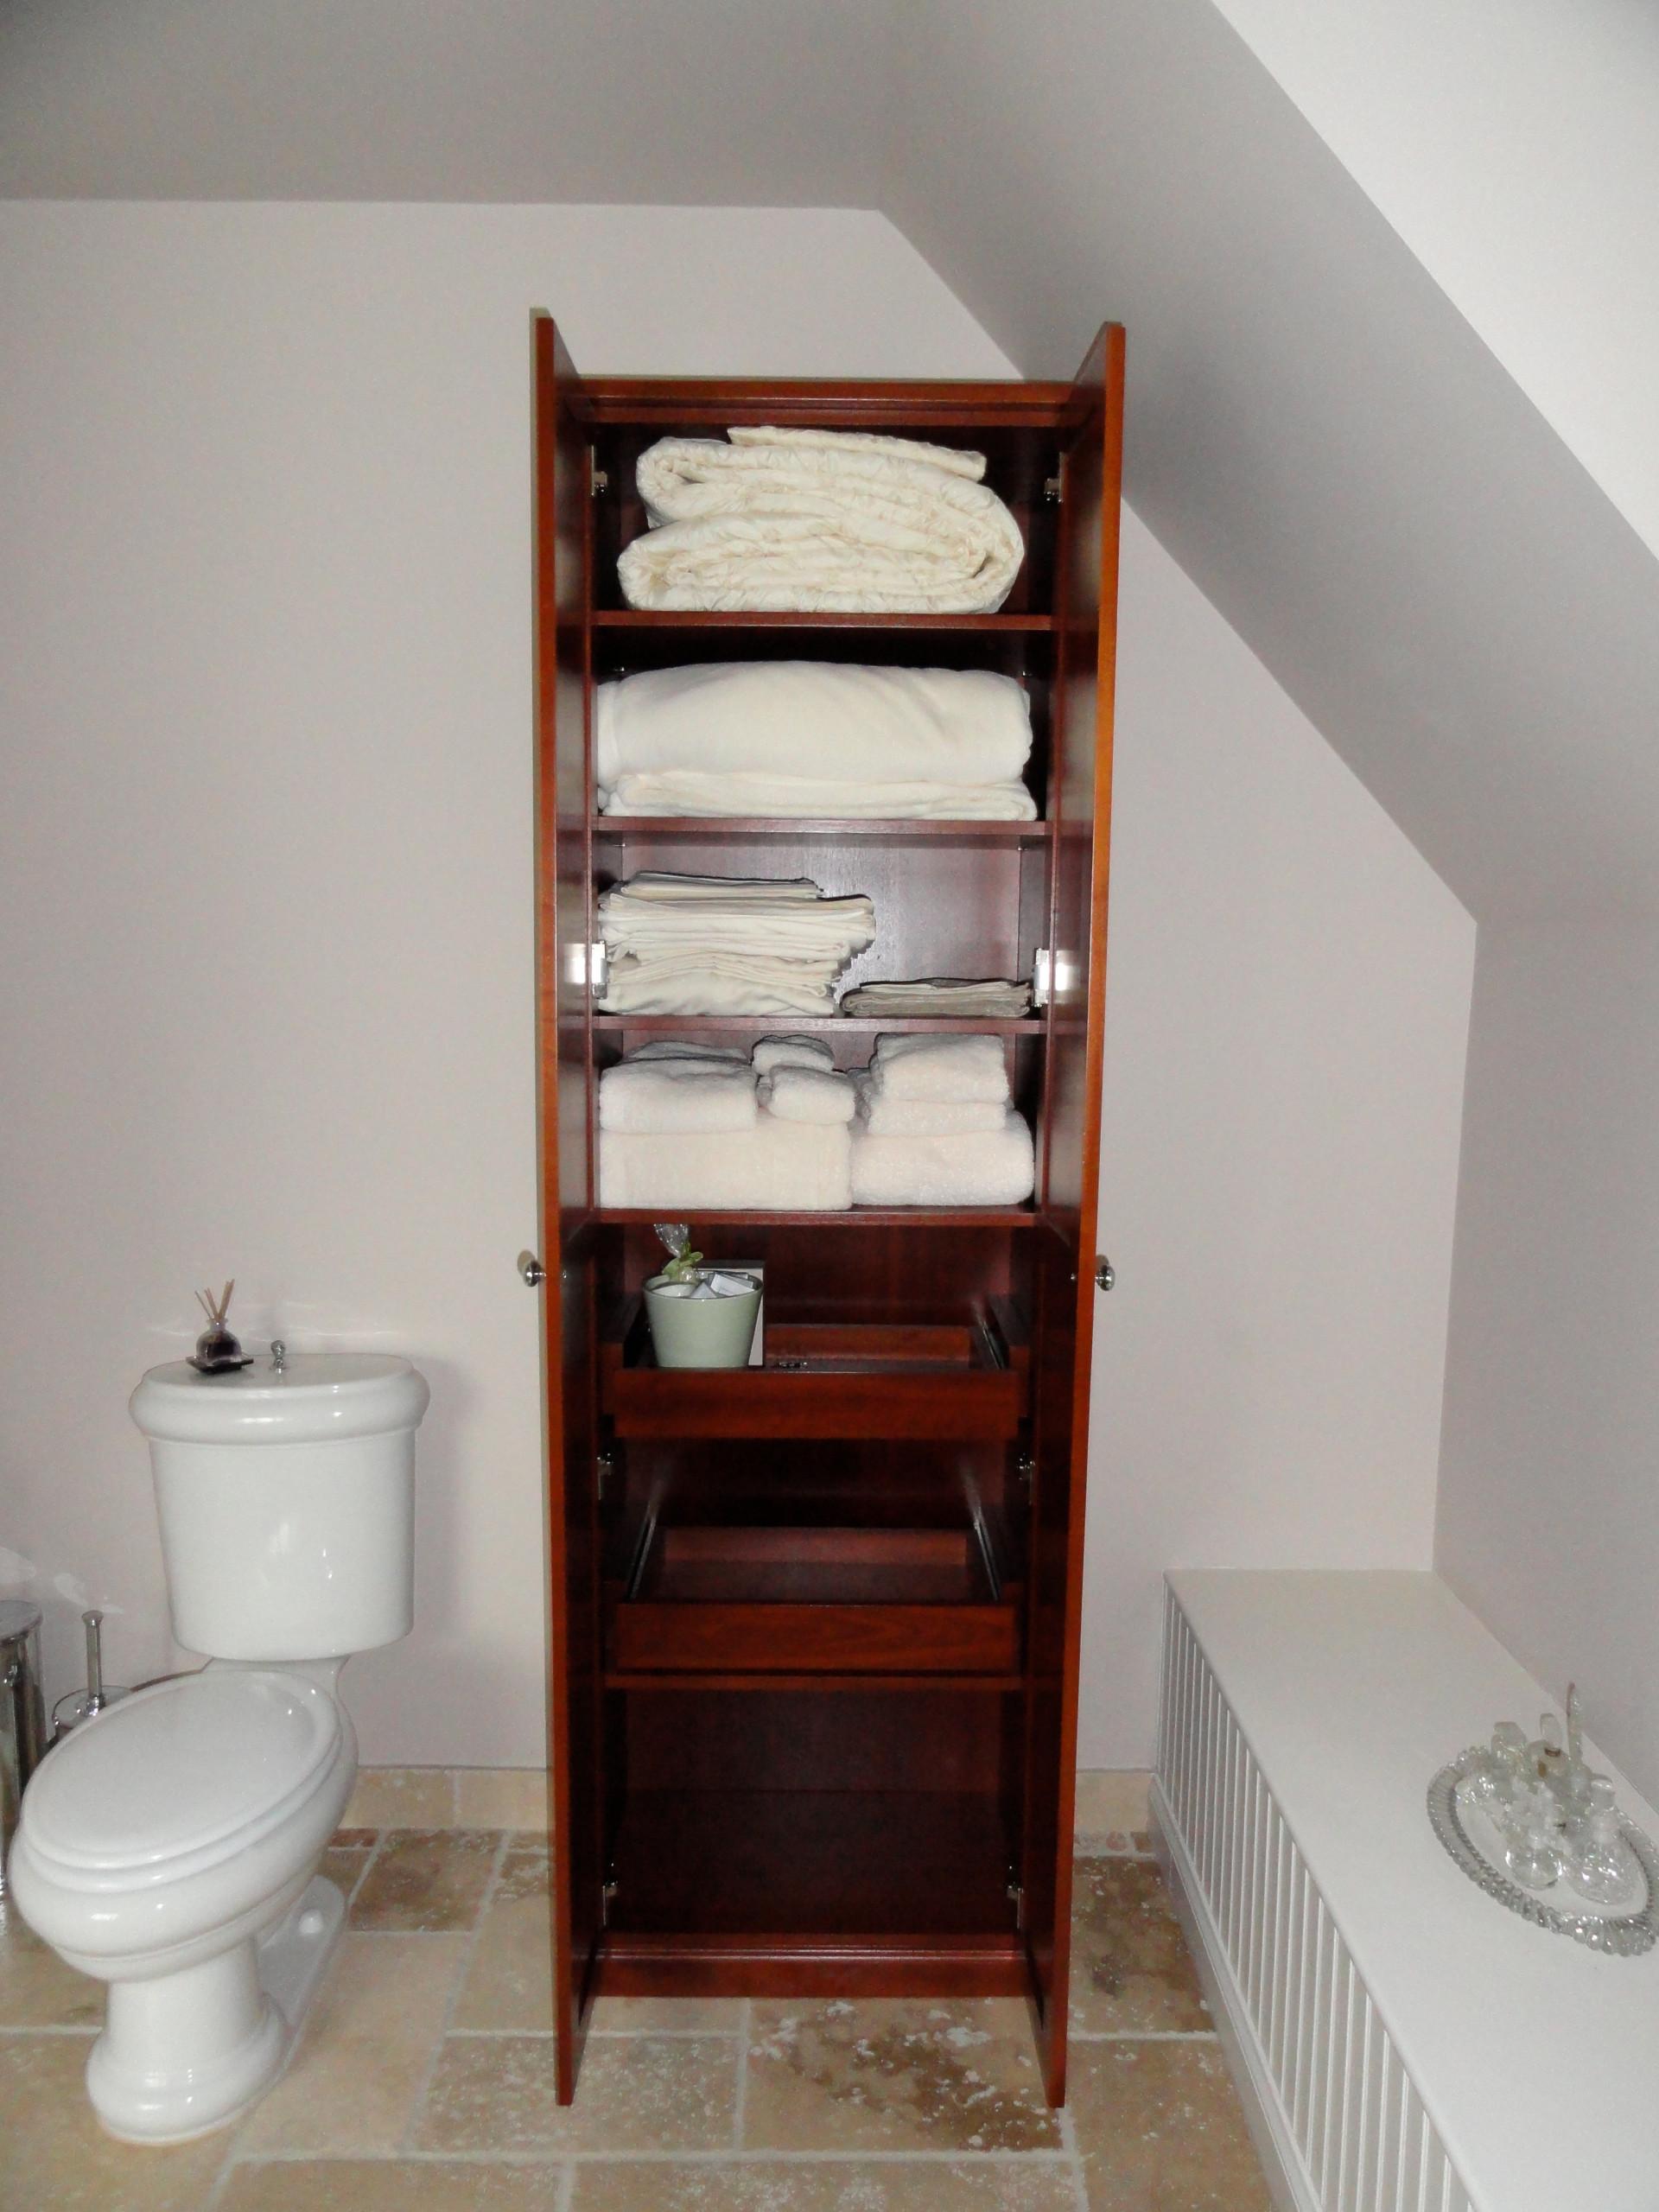 Linen Closets/Bathroom Cabinets